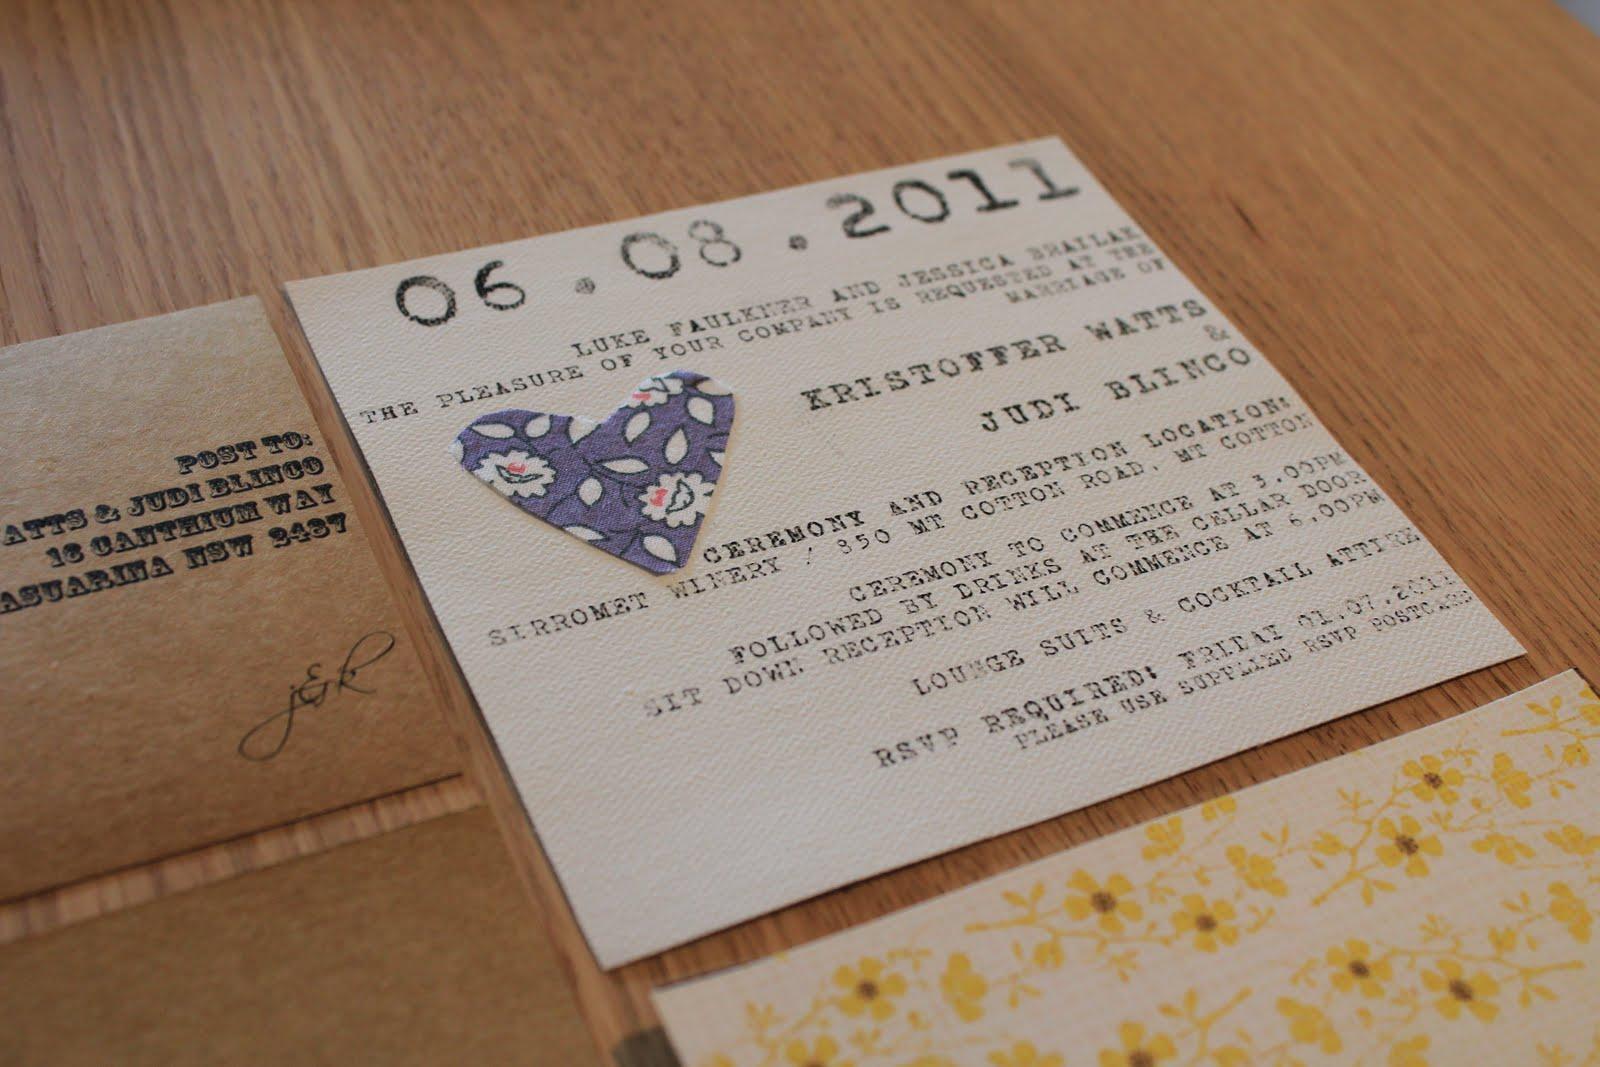 Diy Wedding Invitations Online: Watts Wedding Box: DIY Rustic Wedding Invitations